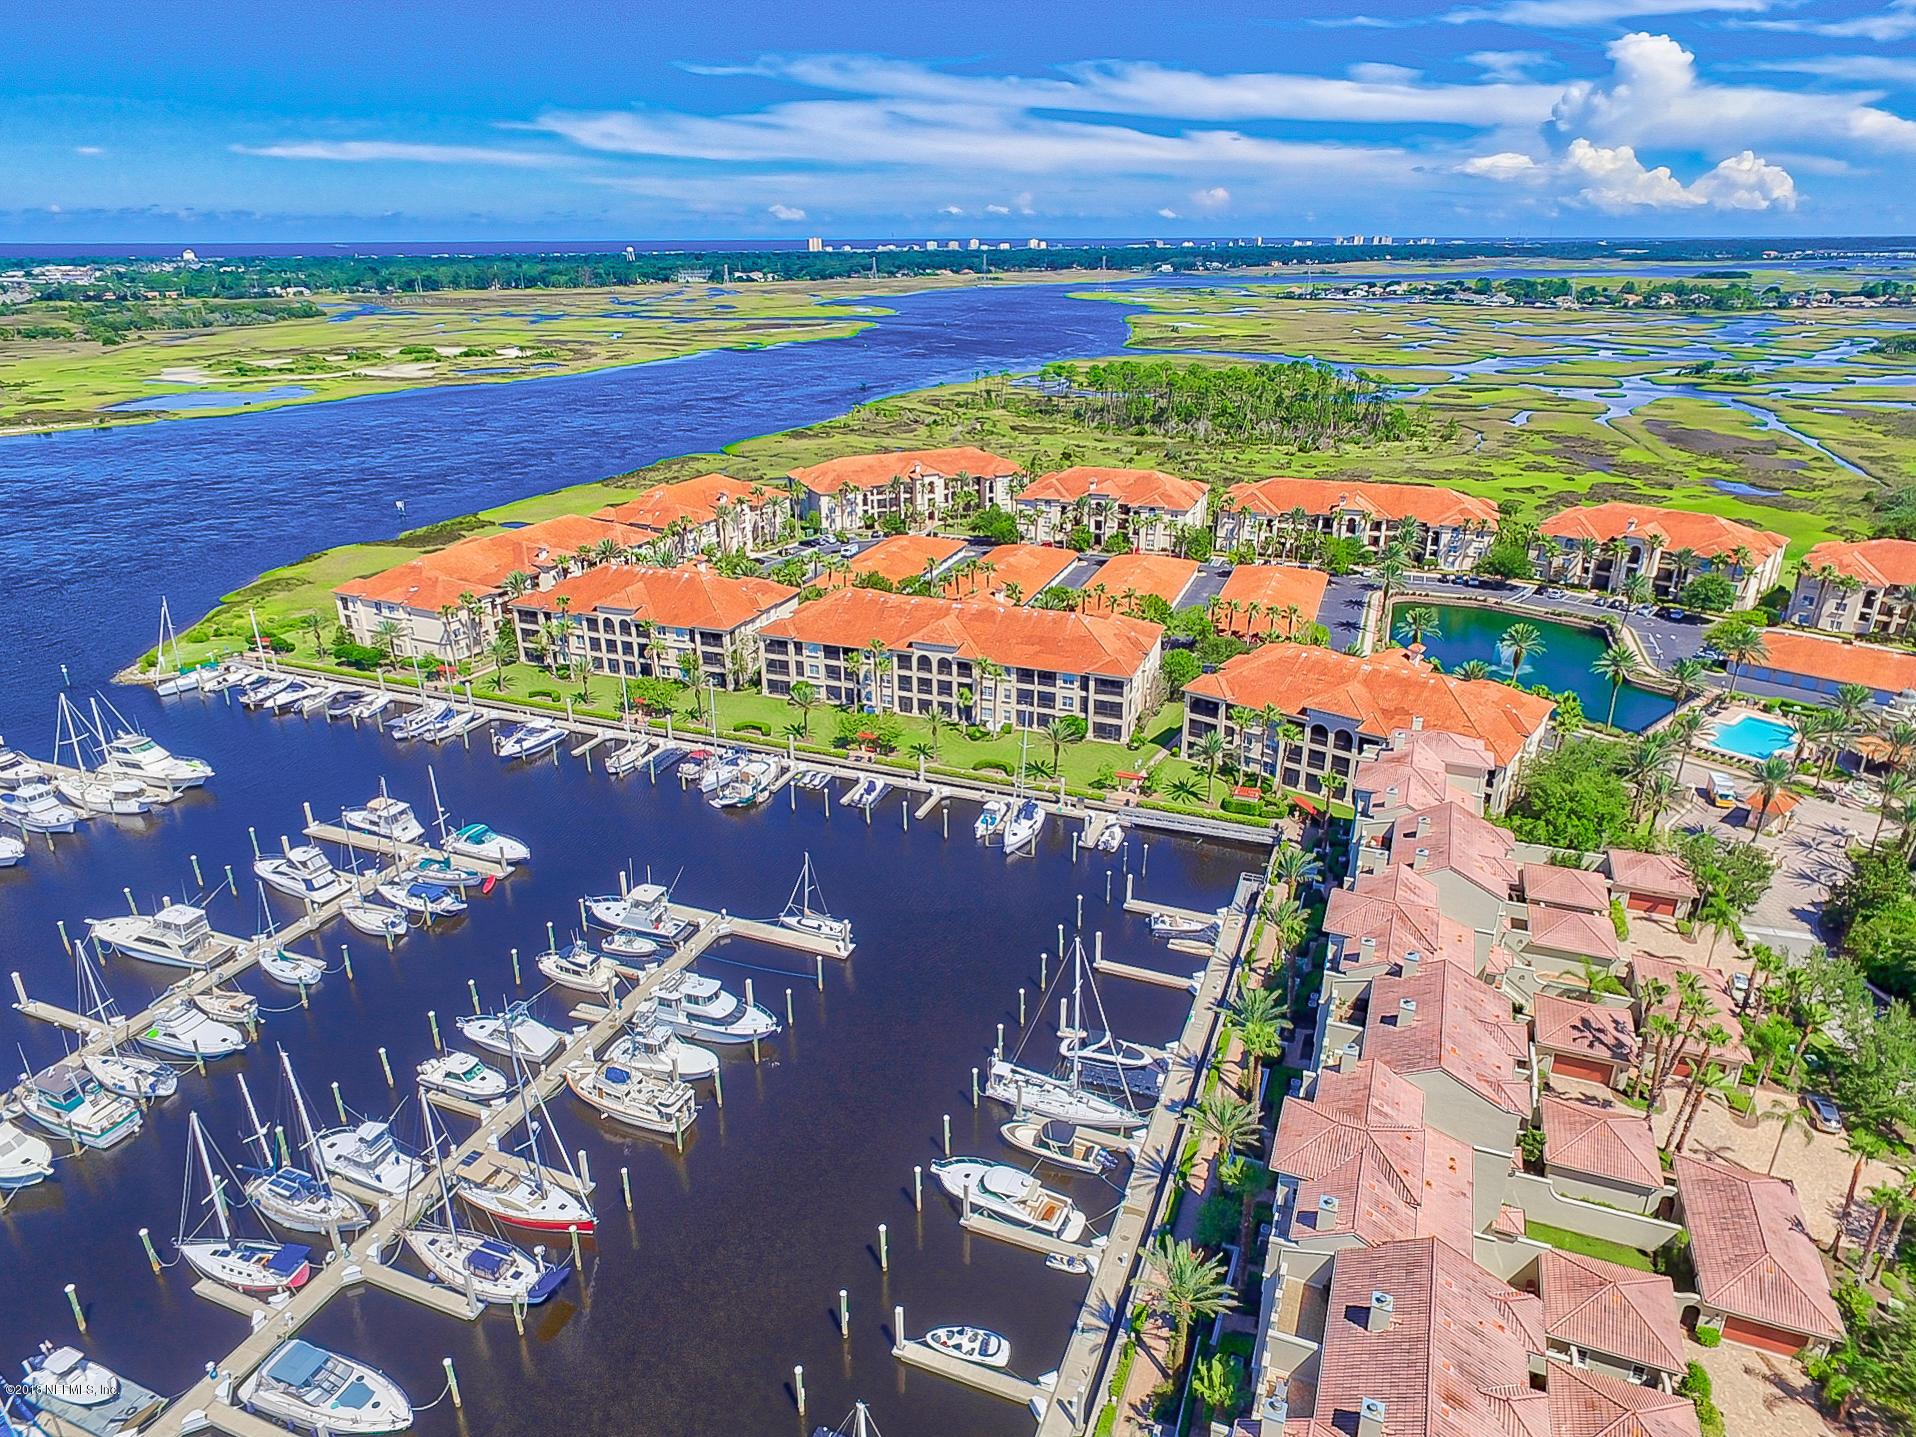 0 ATLANTIC, JACKSONVILLE, FLORIDA 32224, ,Condo,For sale,ATLANTIC,999965